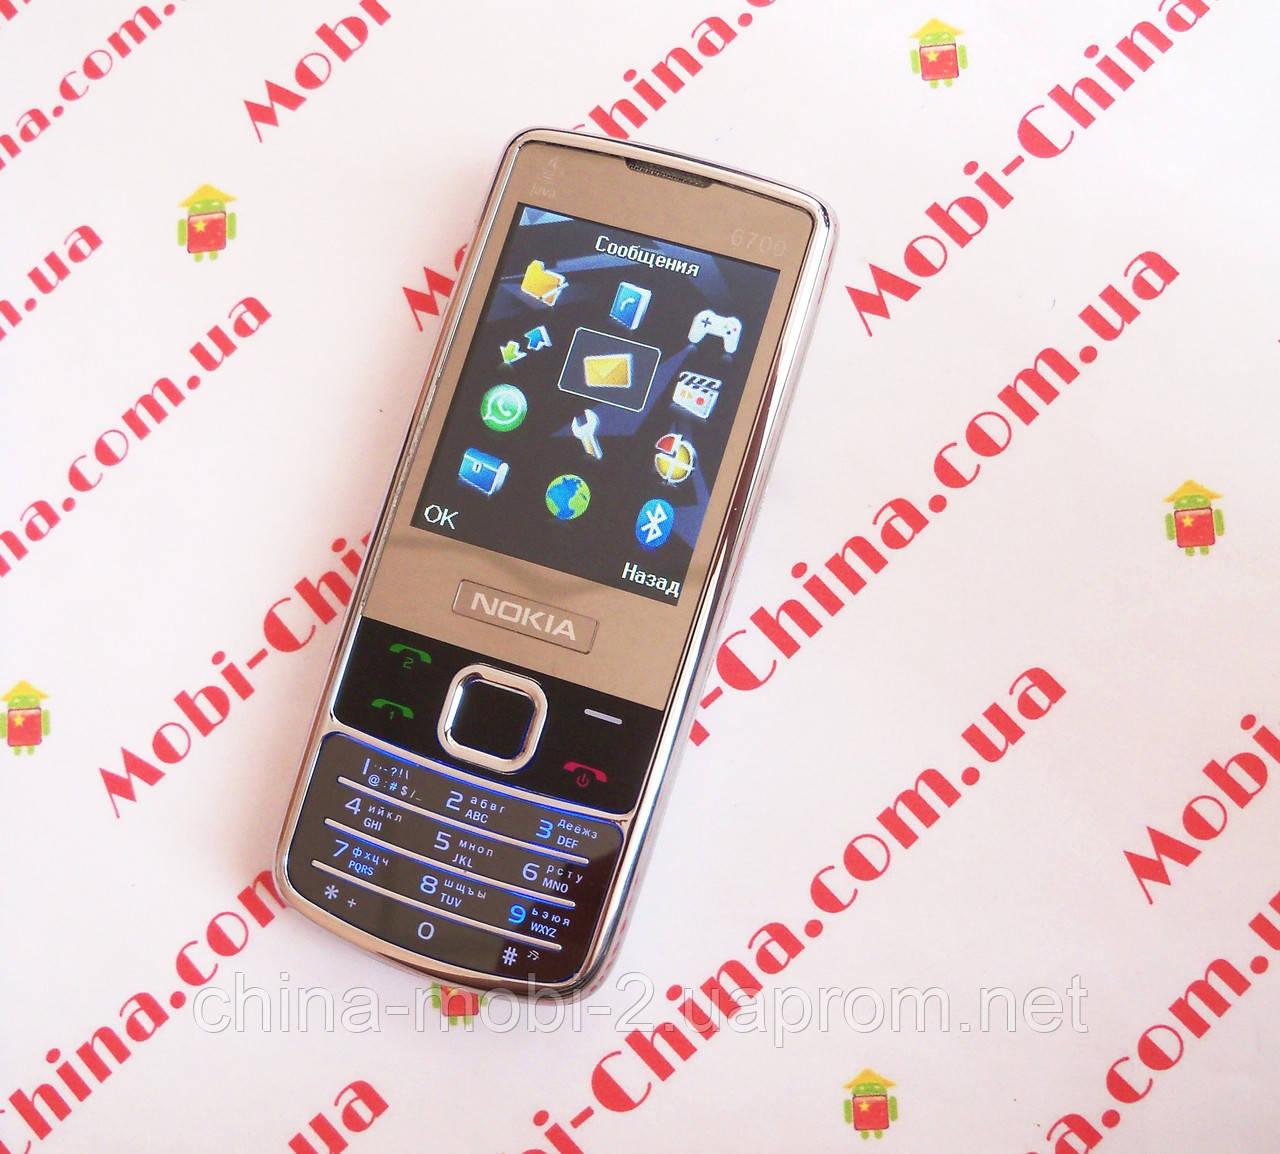 Копия Nokia 6700 silver  Hope 6700